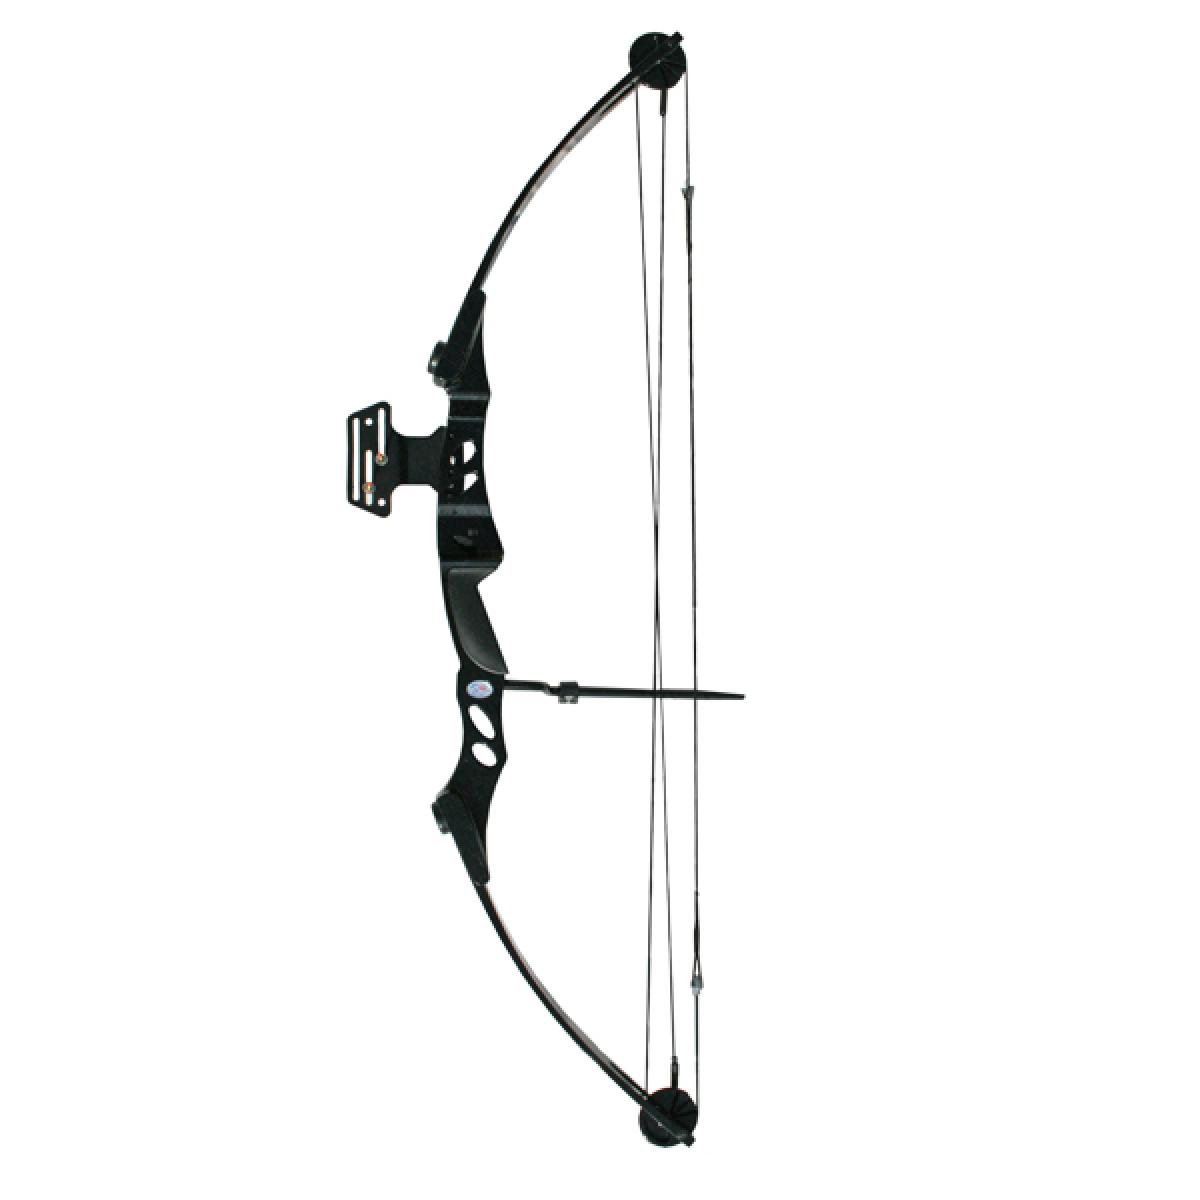 Archery 55lb Black Compound Bow - Archery PNG HD